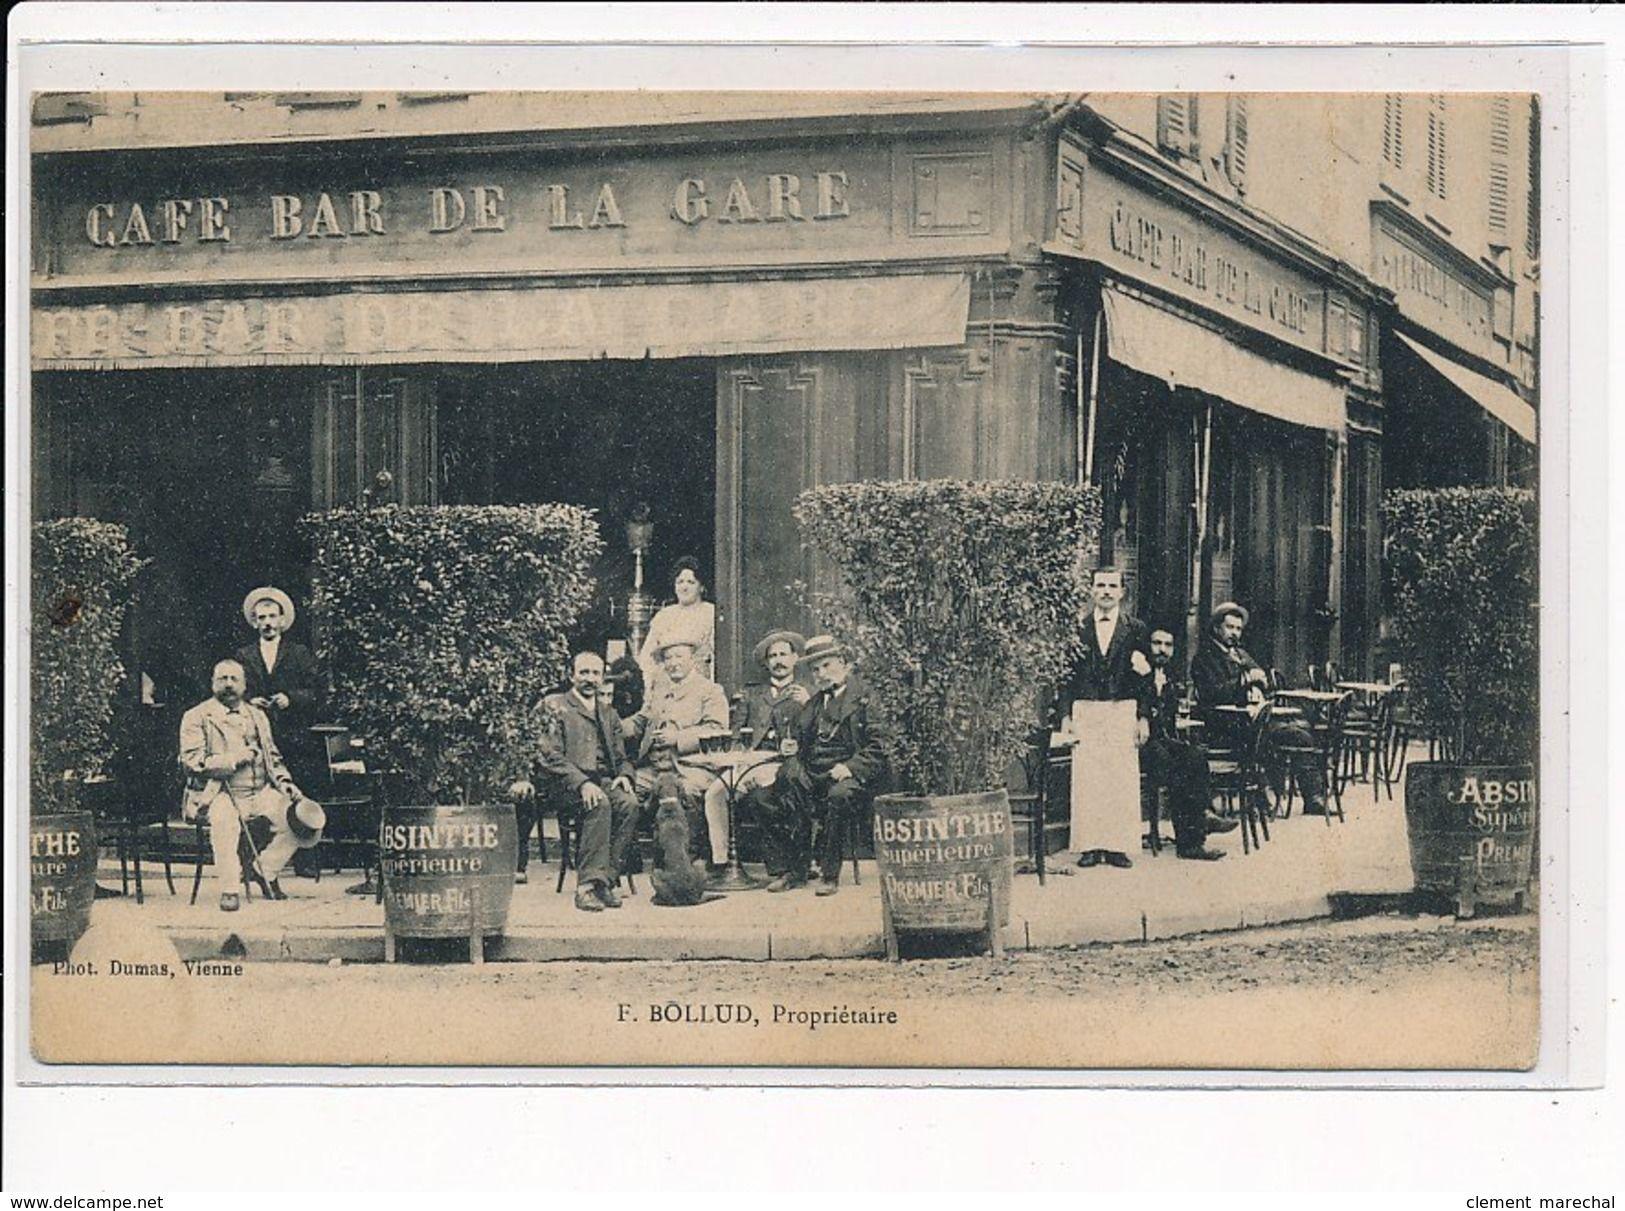 0dbcbae3abdce6fb0aaede66cd3a51cd Impressionnant De Bar De Jardin Des Idées